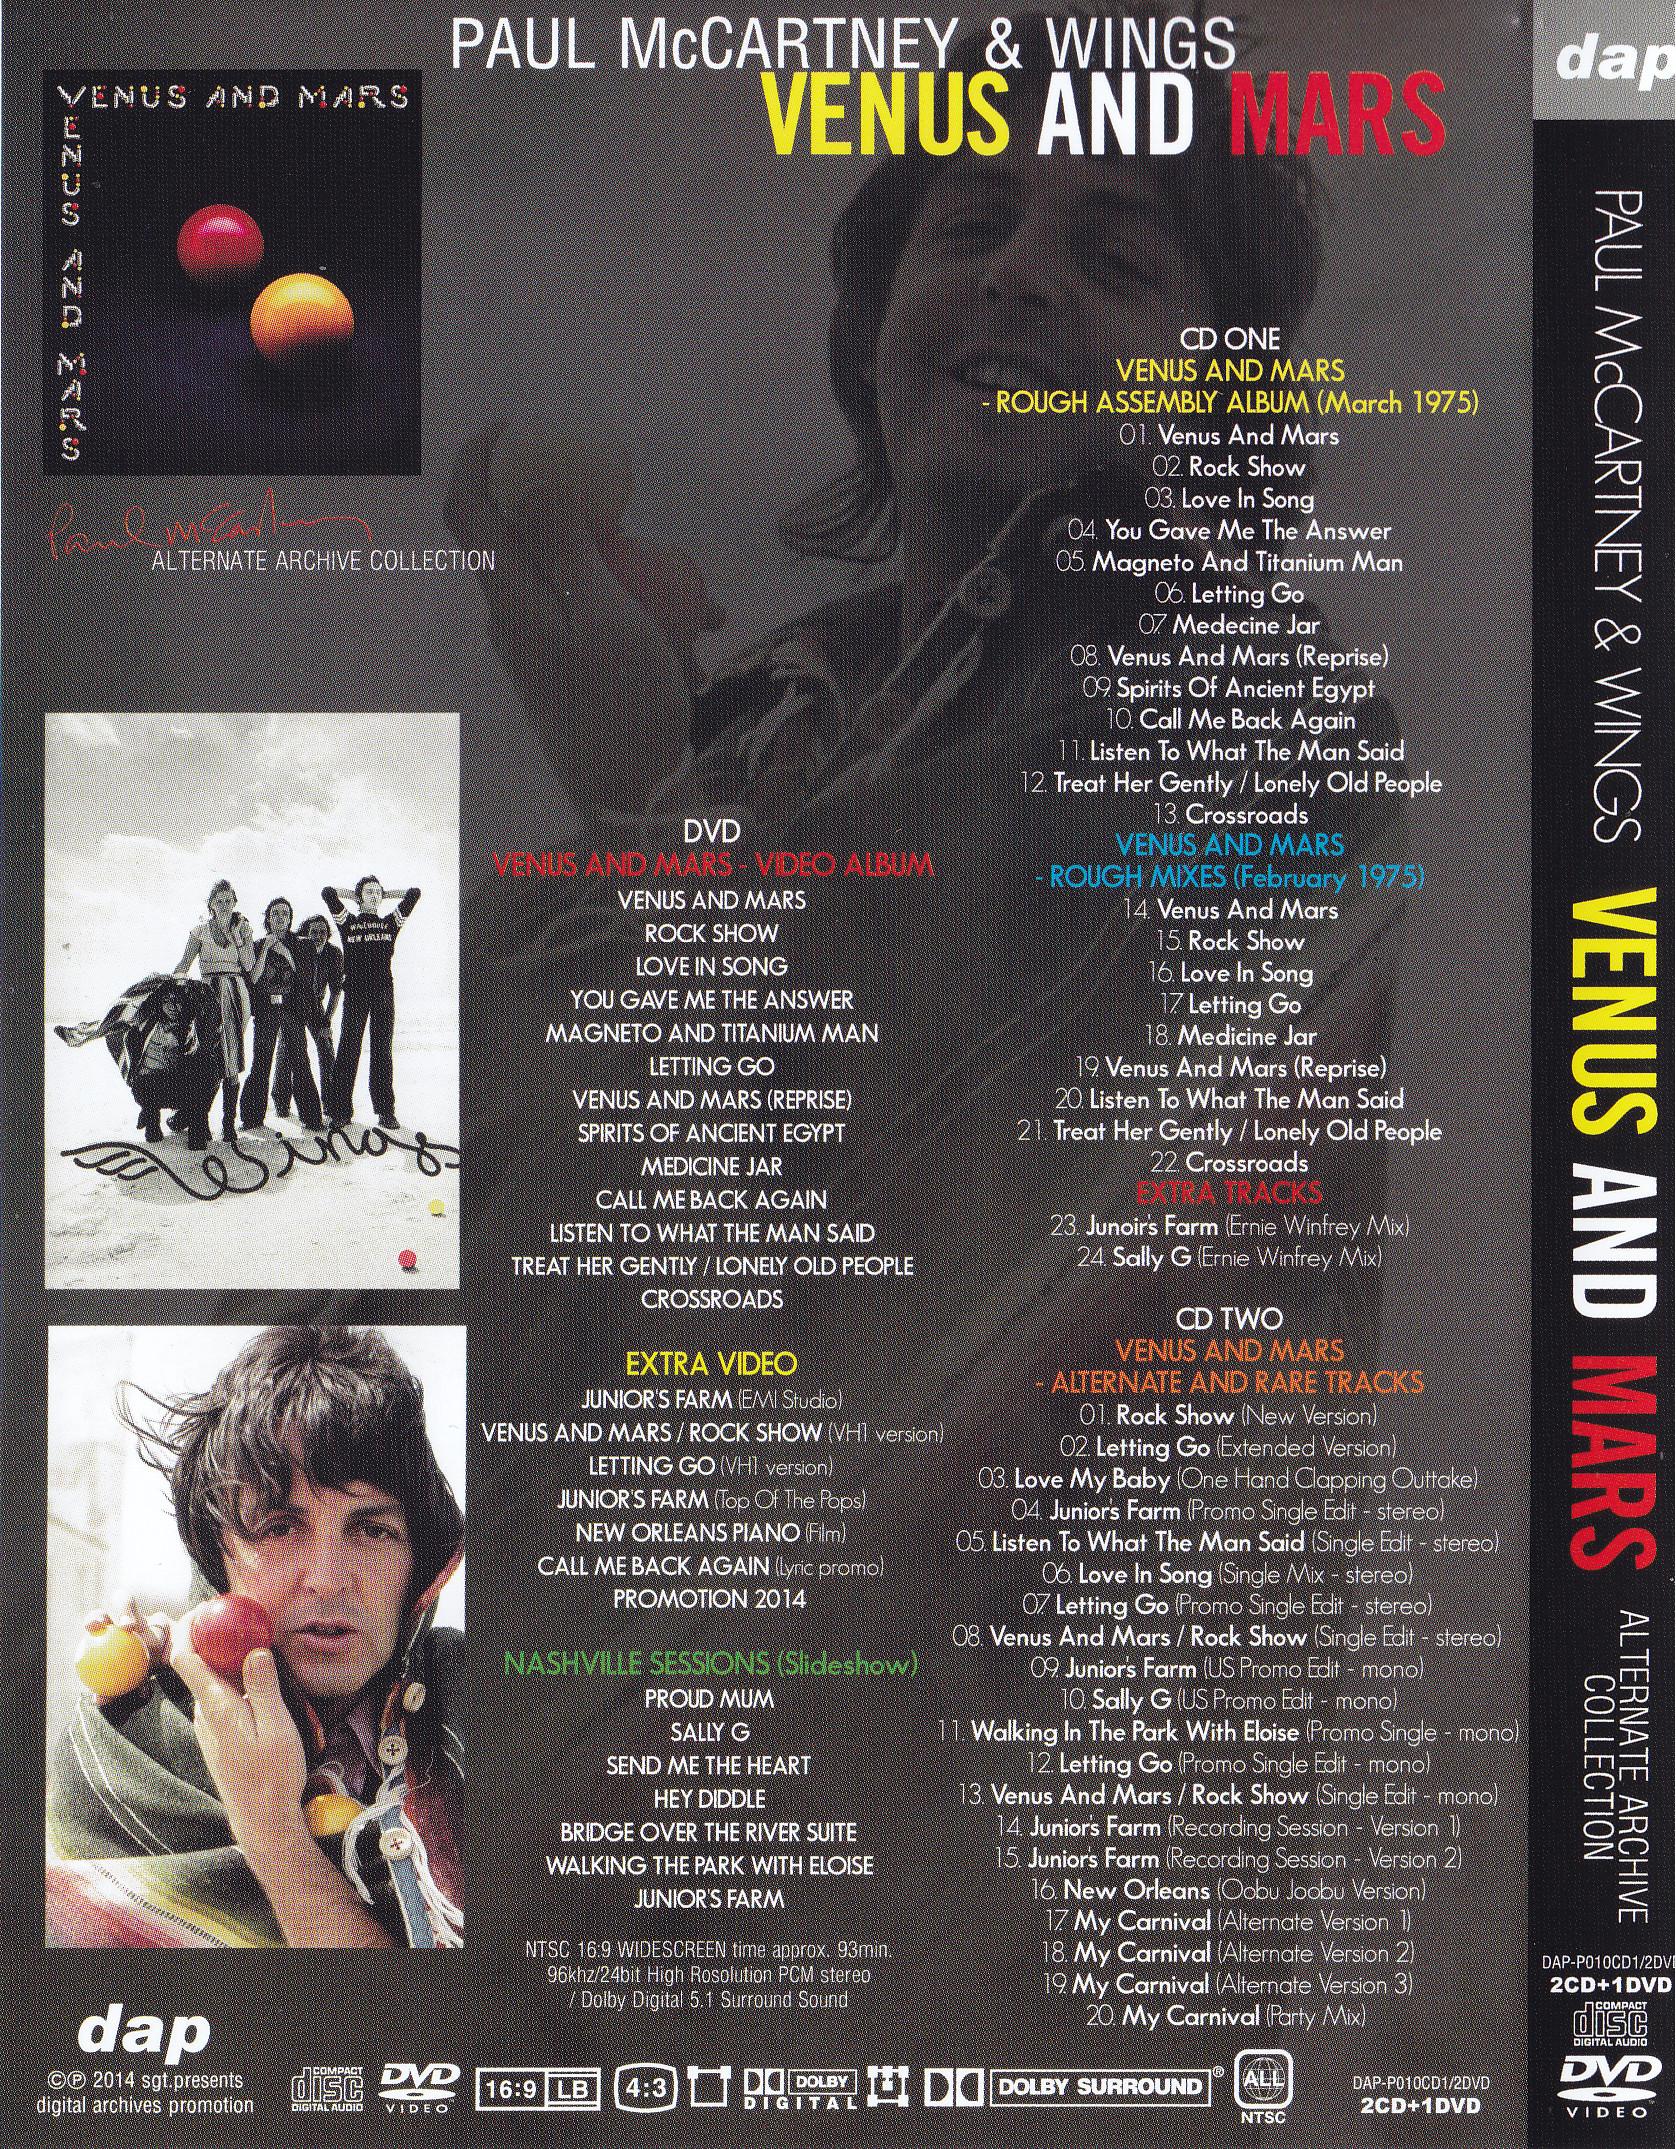 Paul McCartney & Wings / Venus And Mars Alternate Archive